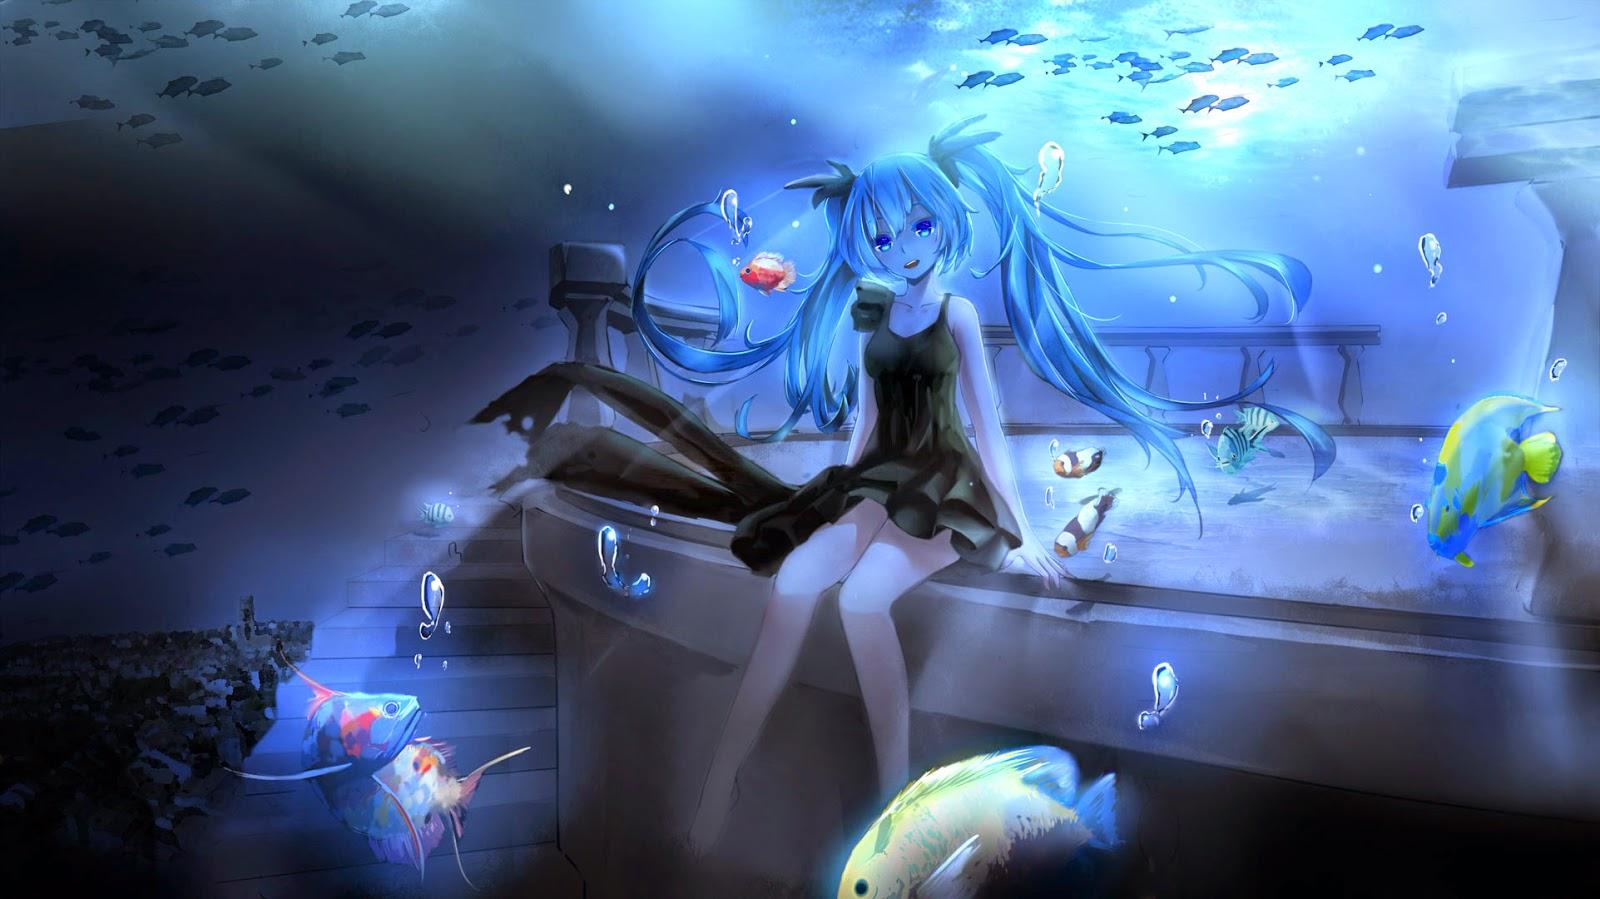 Papel de Parede Garota Anime Japonês para pc 3d hd anime girl wallpaper